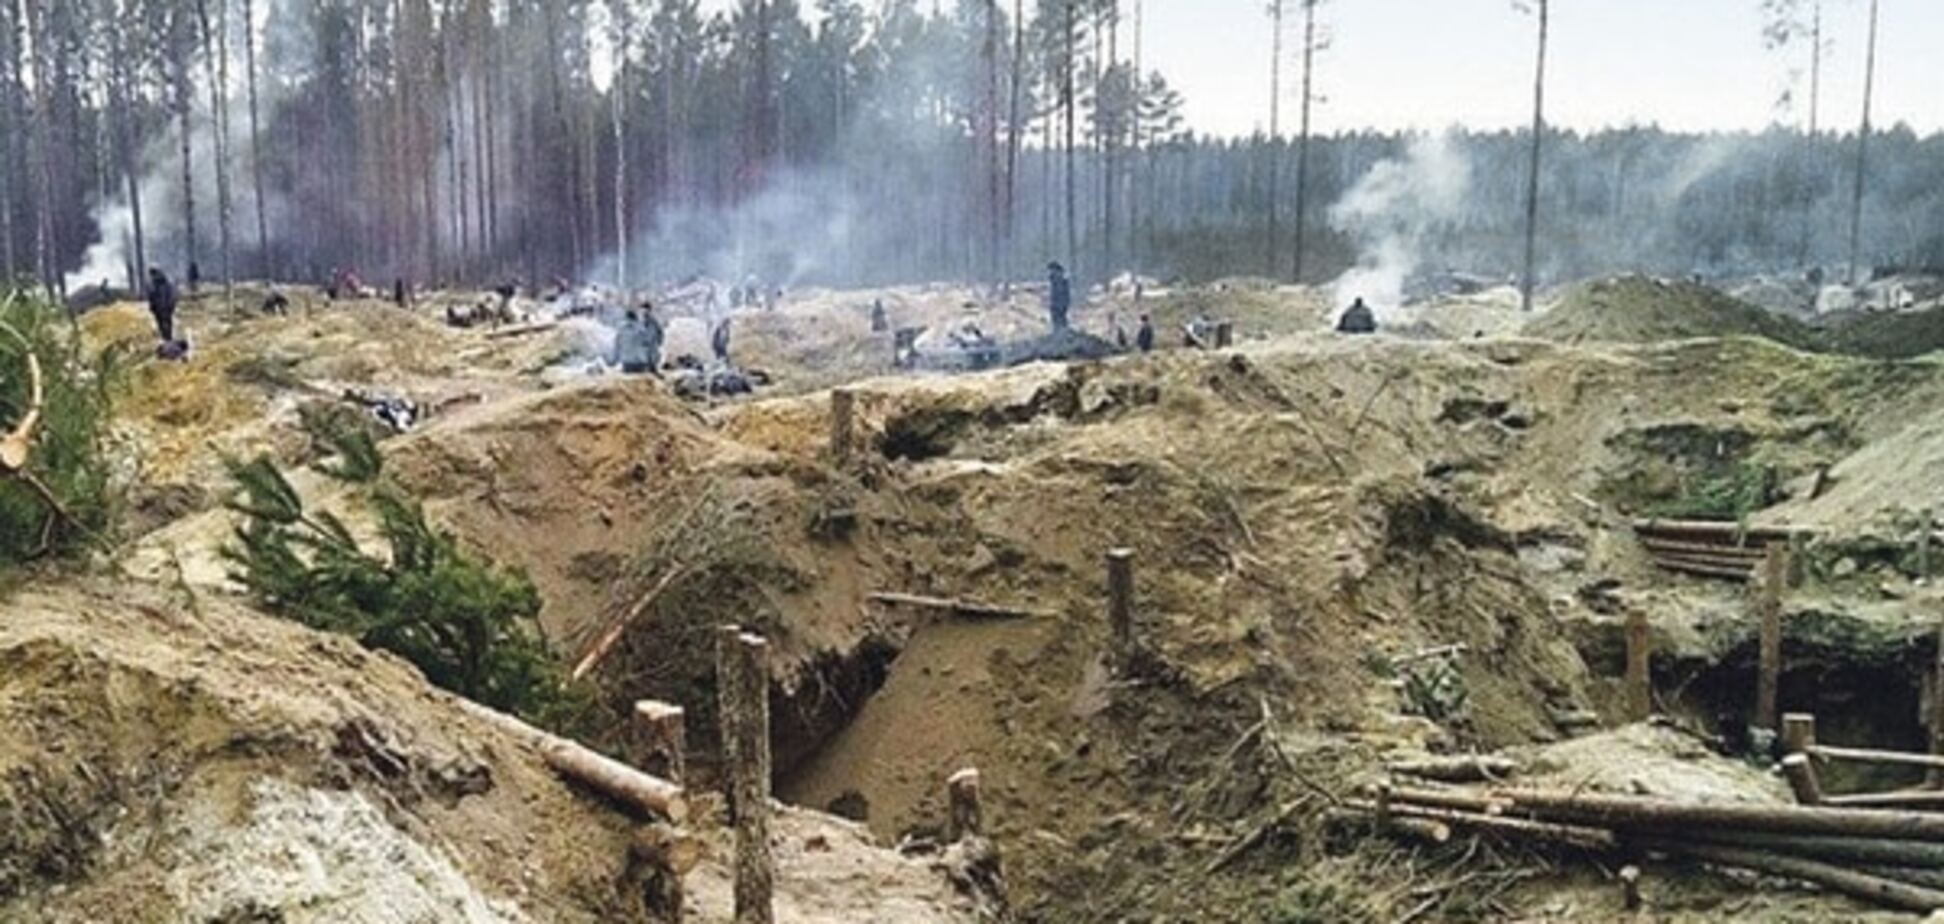 янтарь Украины, незаконная добыча